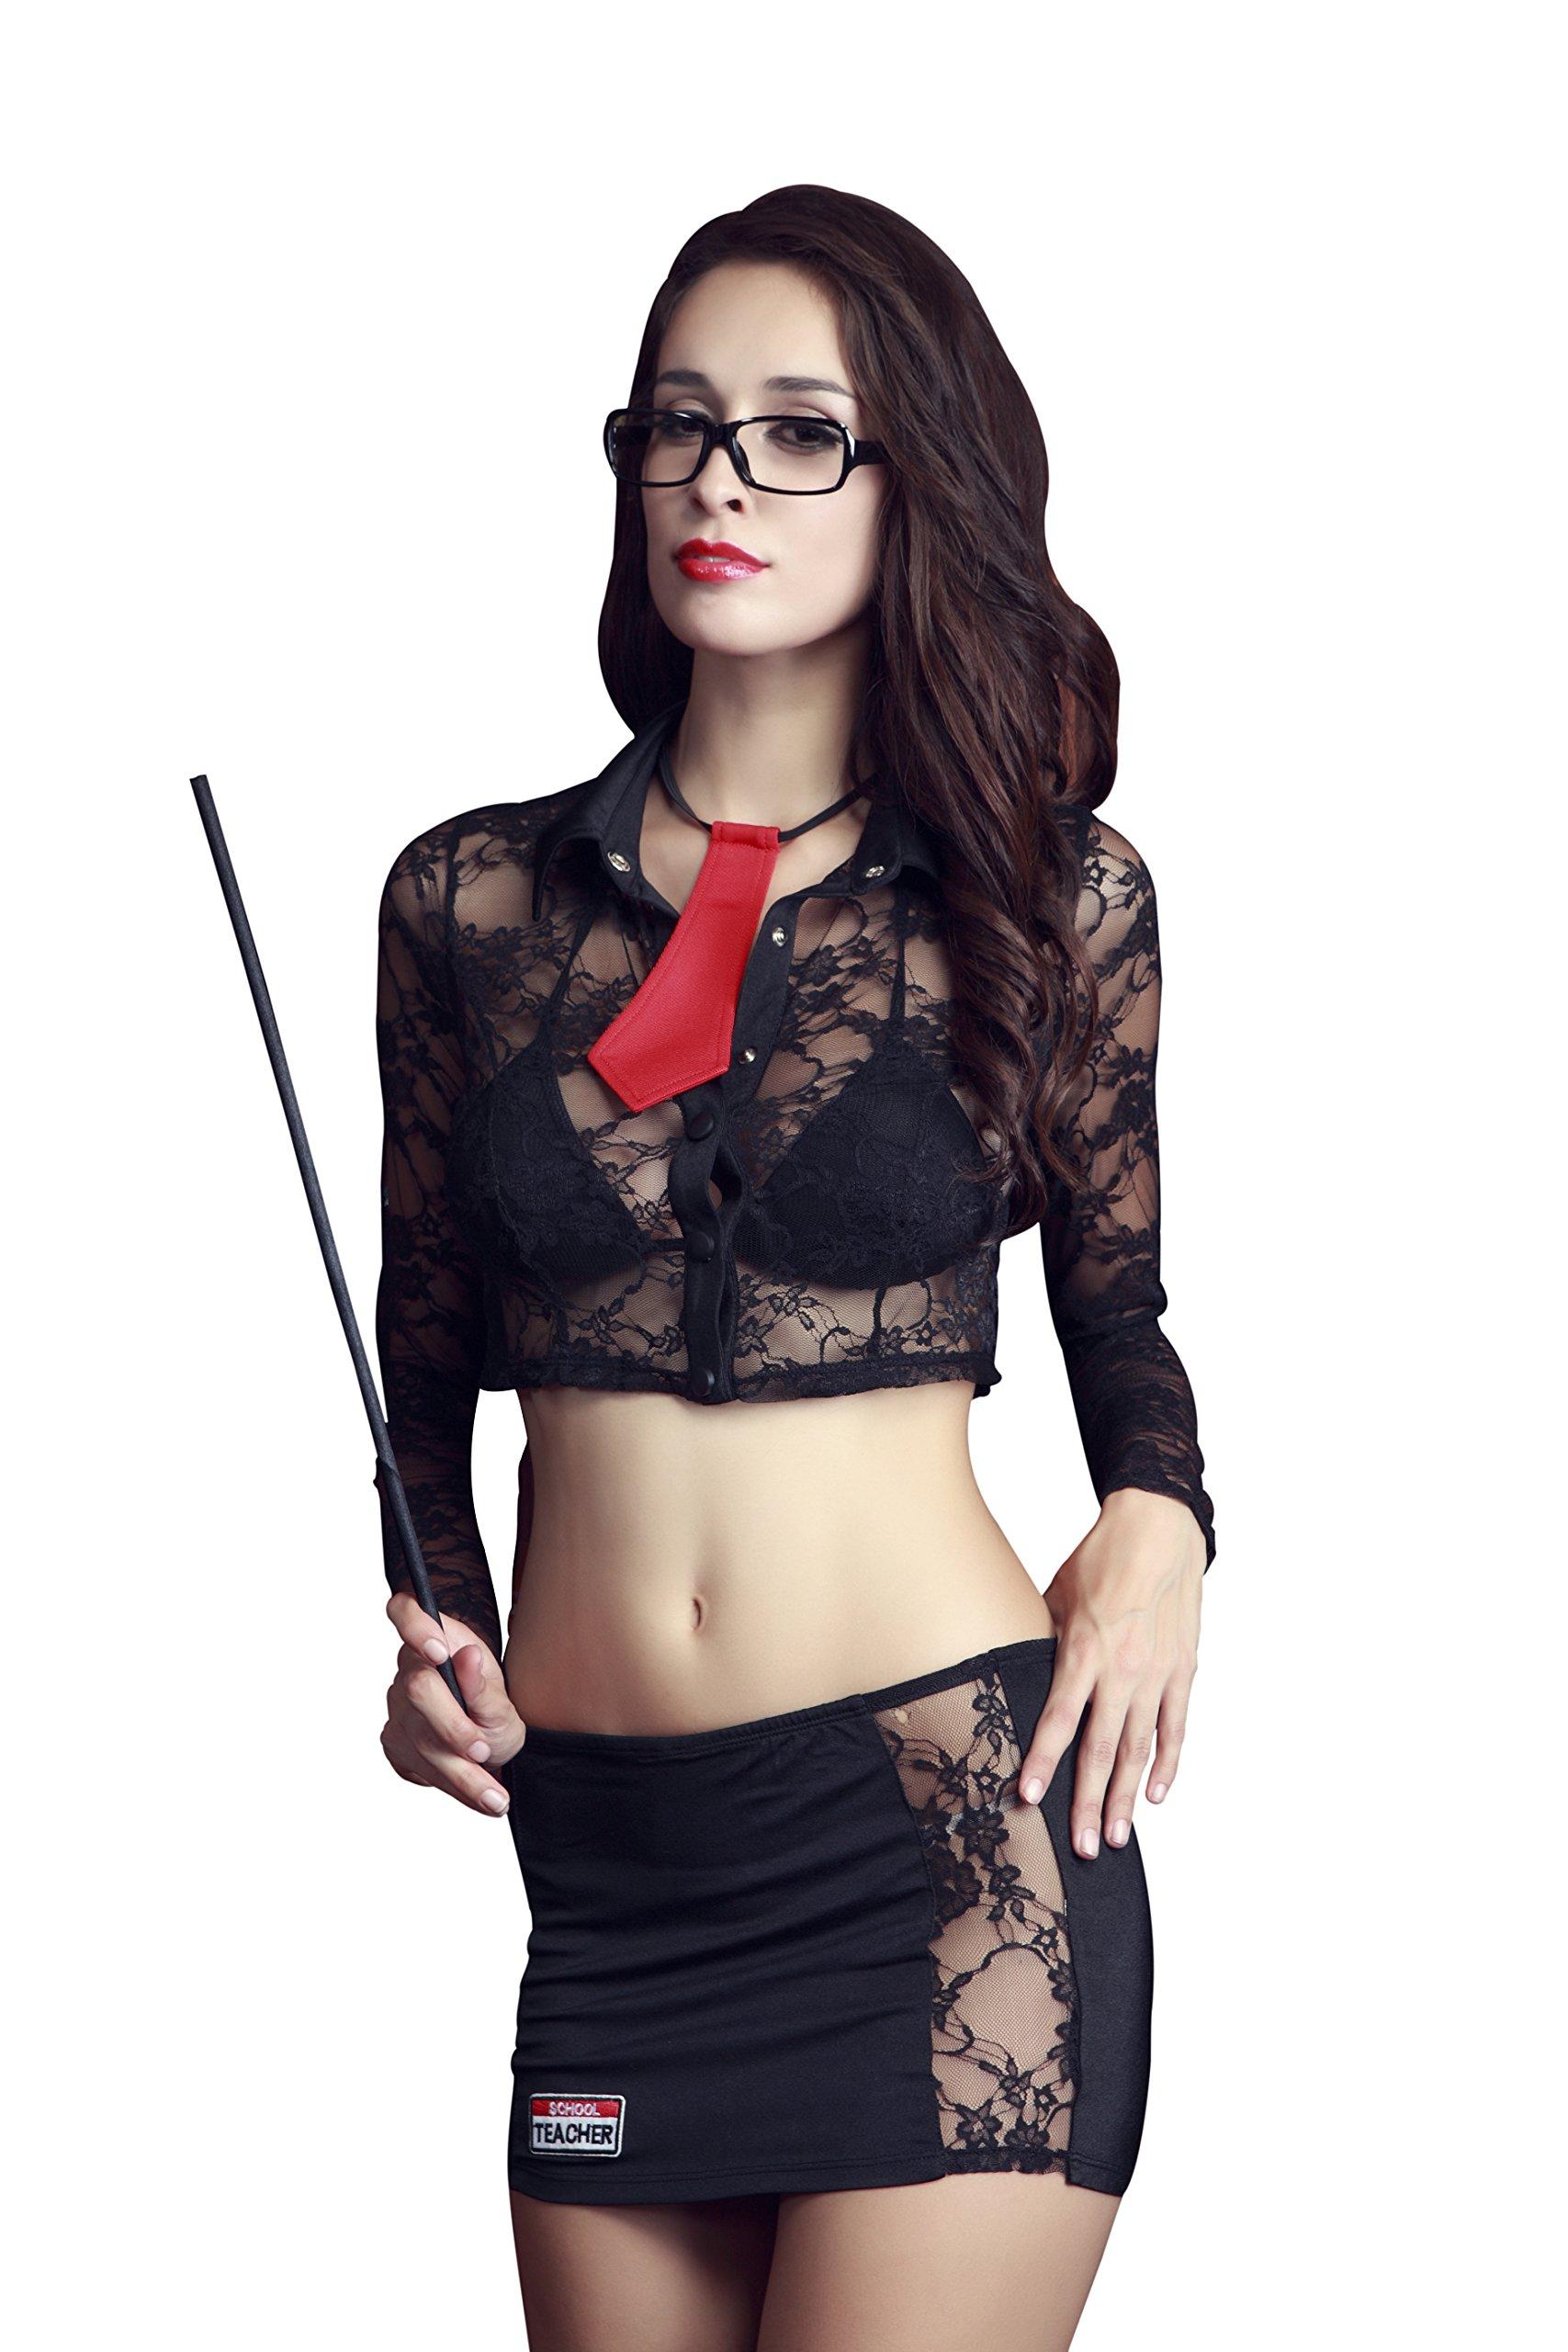 REINDEAR Sexy Business Attire Uniform Complete Set Nightie Racy Lingerie US Seller (Professor)